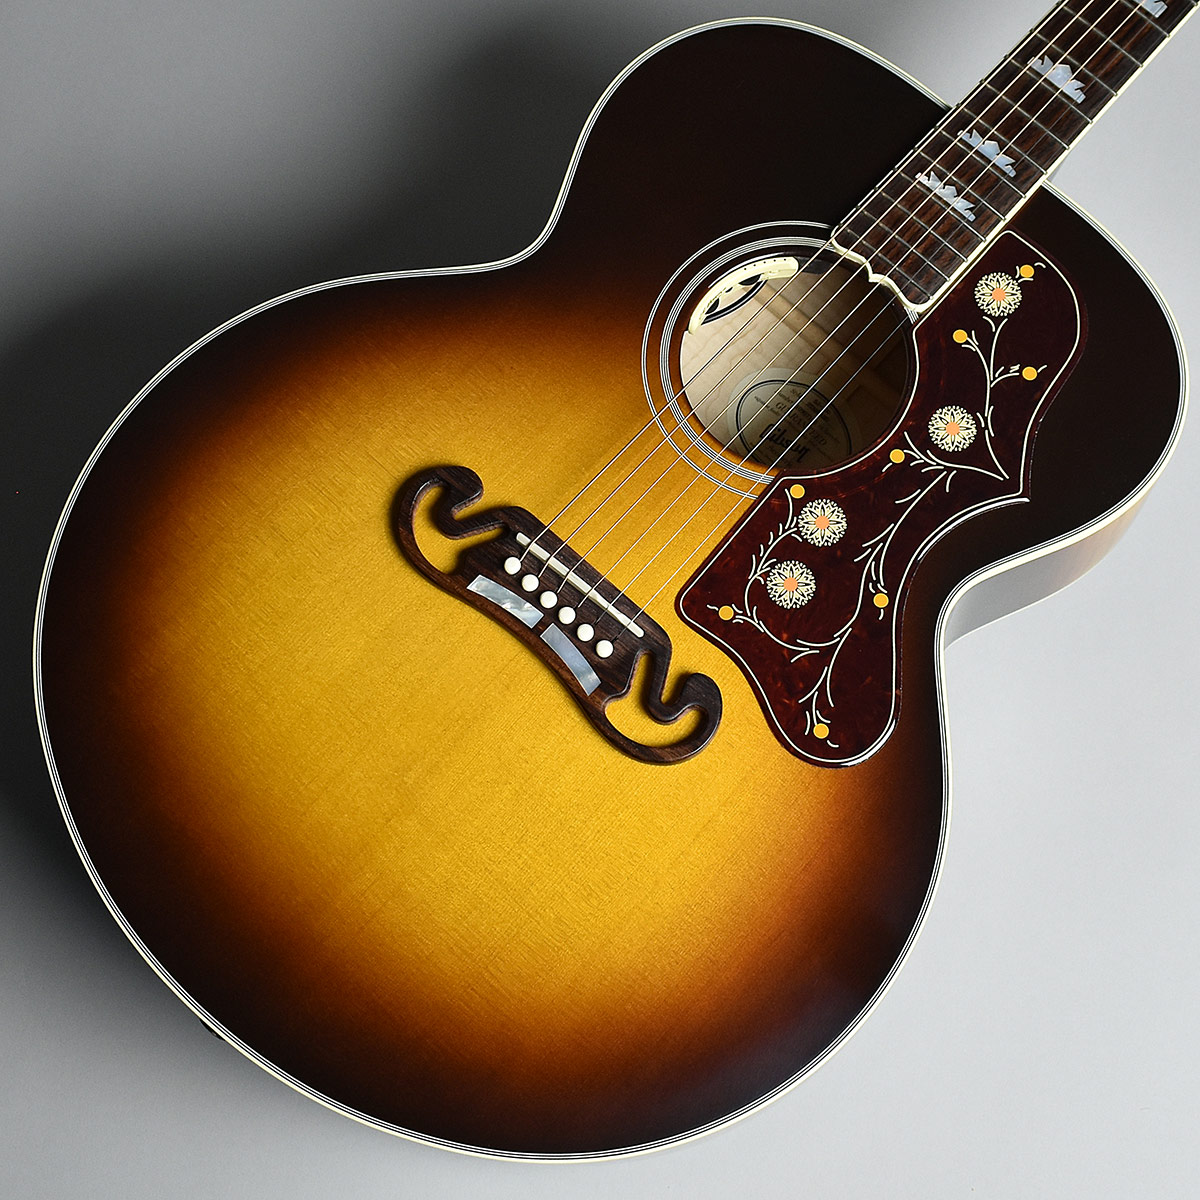 Gibson J-200 STANDARD Vintage Sunburst S/N:10907100 エレアコ 【ギブソン J200】【未展示品】